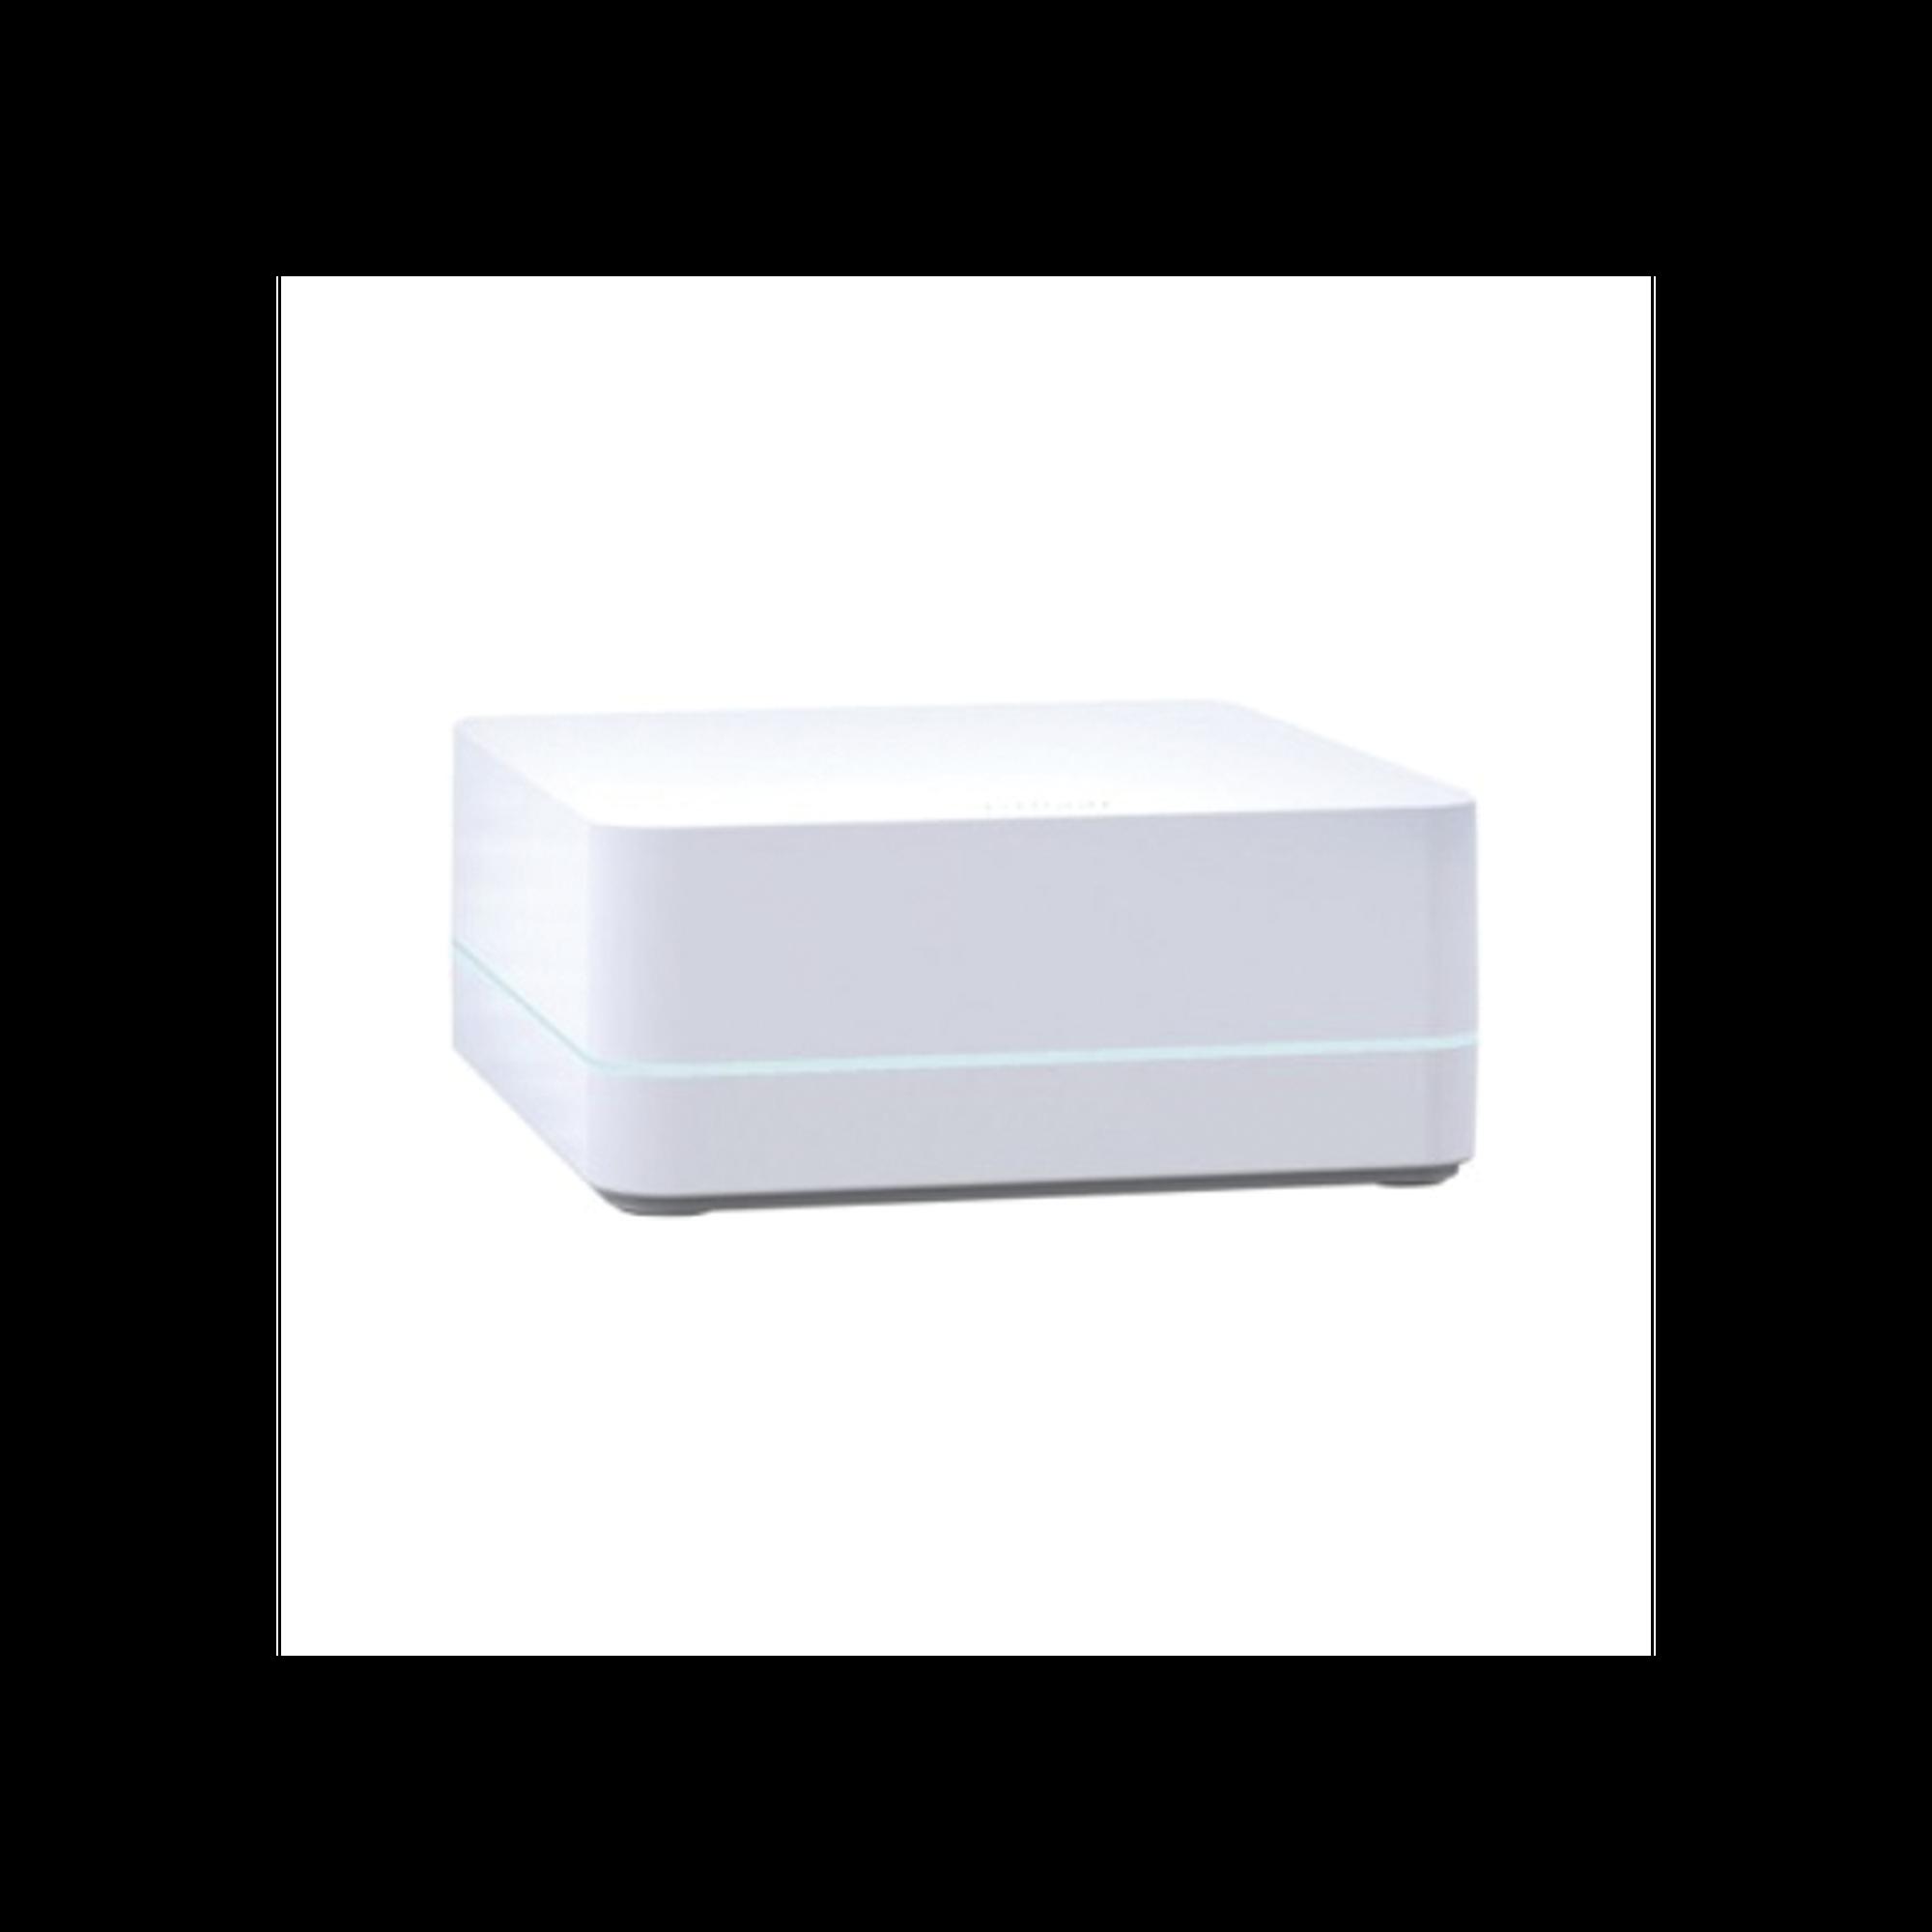 Controlador HUB principal para Caseta Wireless LUTRON, soporta 50 dispositivos, 1 repetidor, programacion via App gratuita.